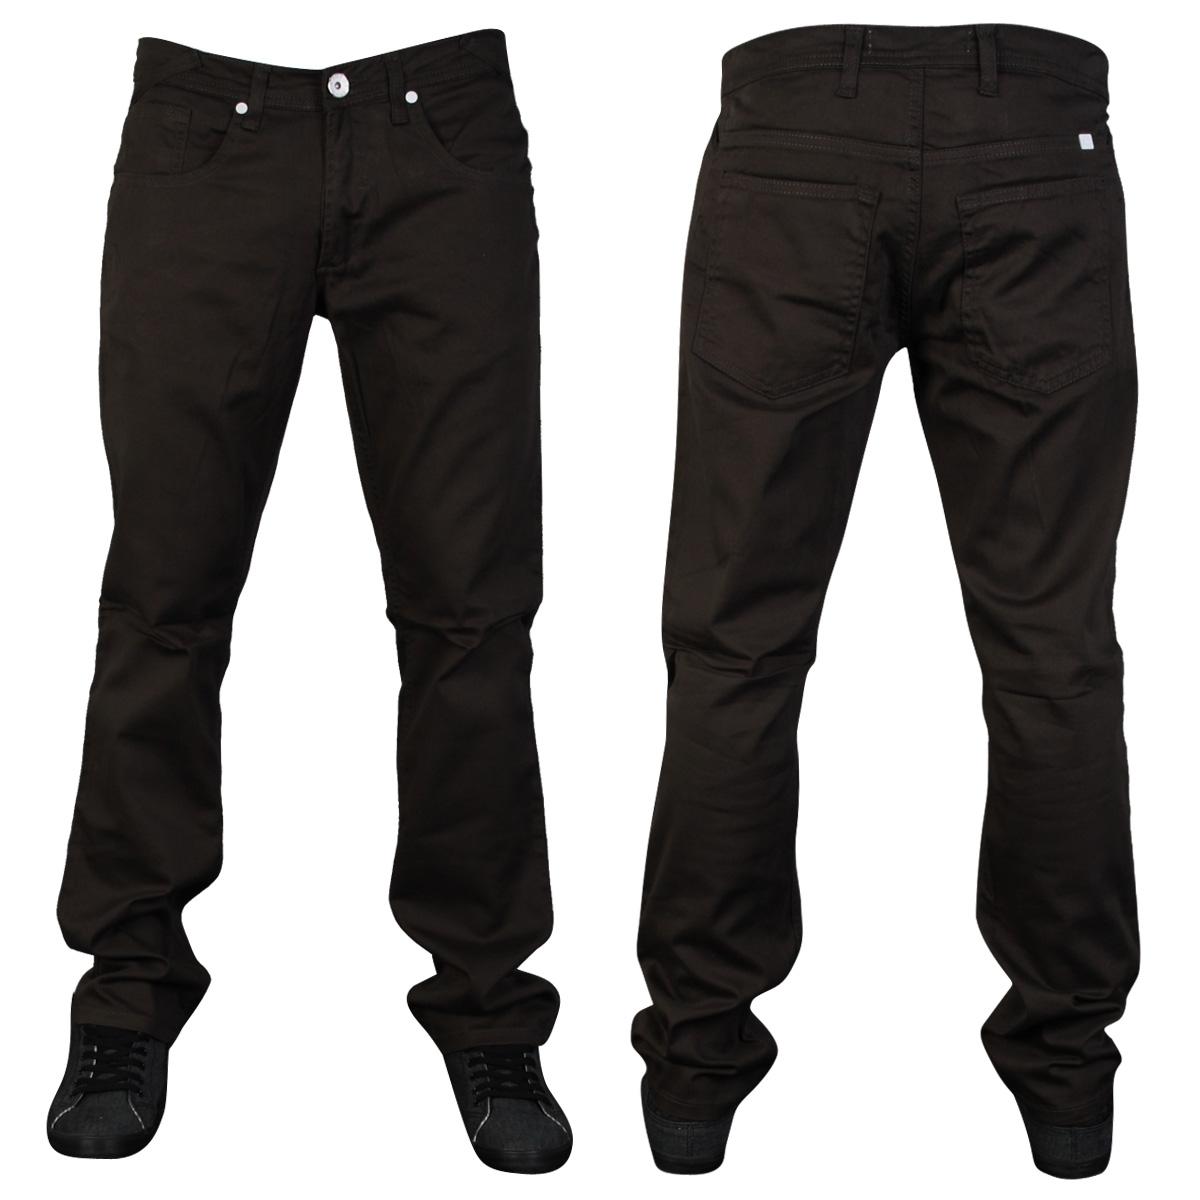 NEW-MENS-ZICO-SKINNY-TWILL-DESIGNER-SLIM-FIT-CHINOS-JEANS-ALL-WAIST-LEG-SIZES